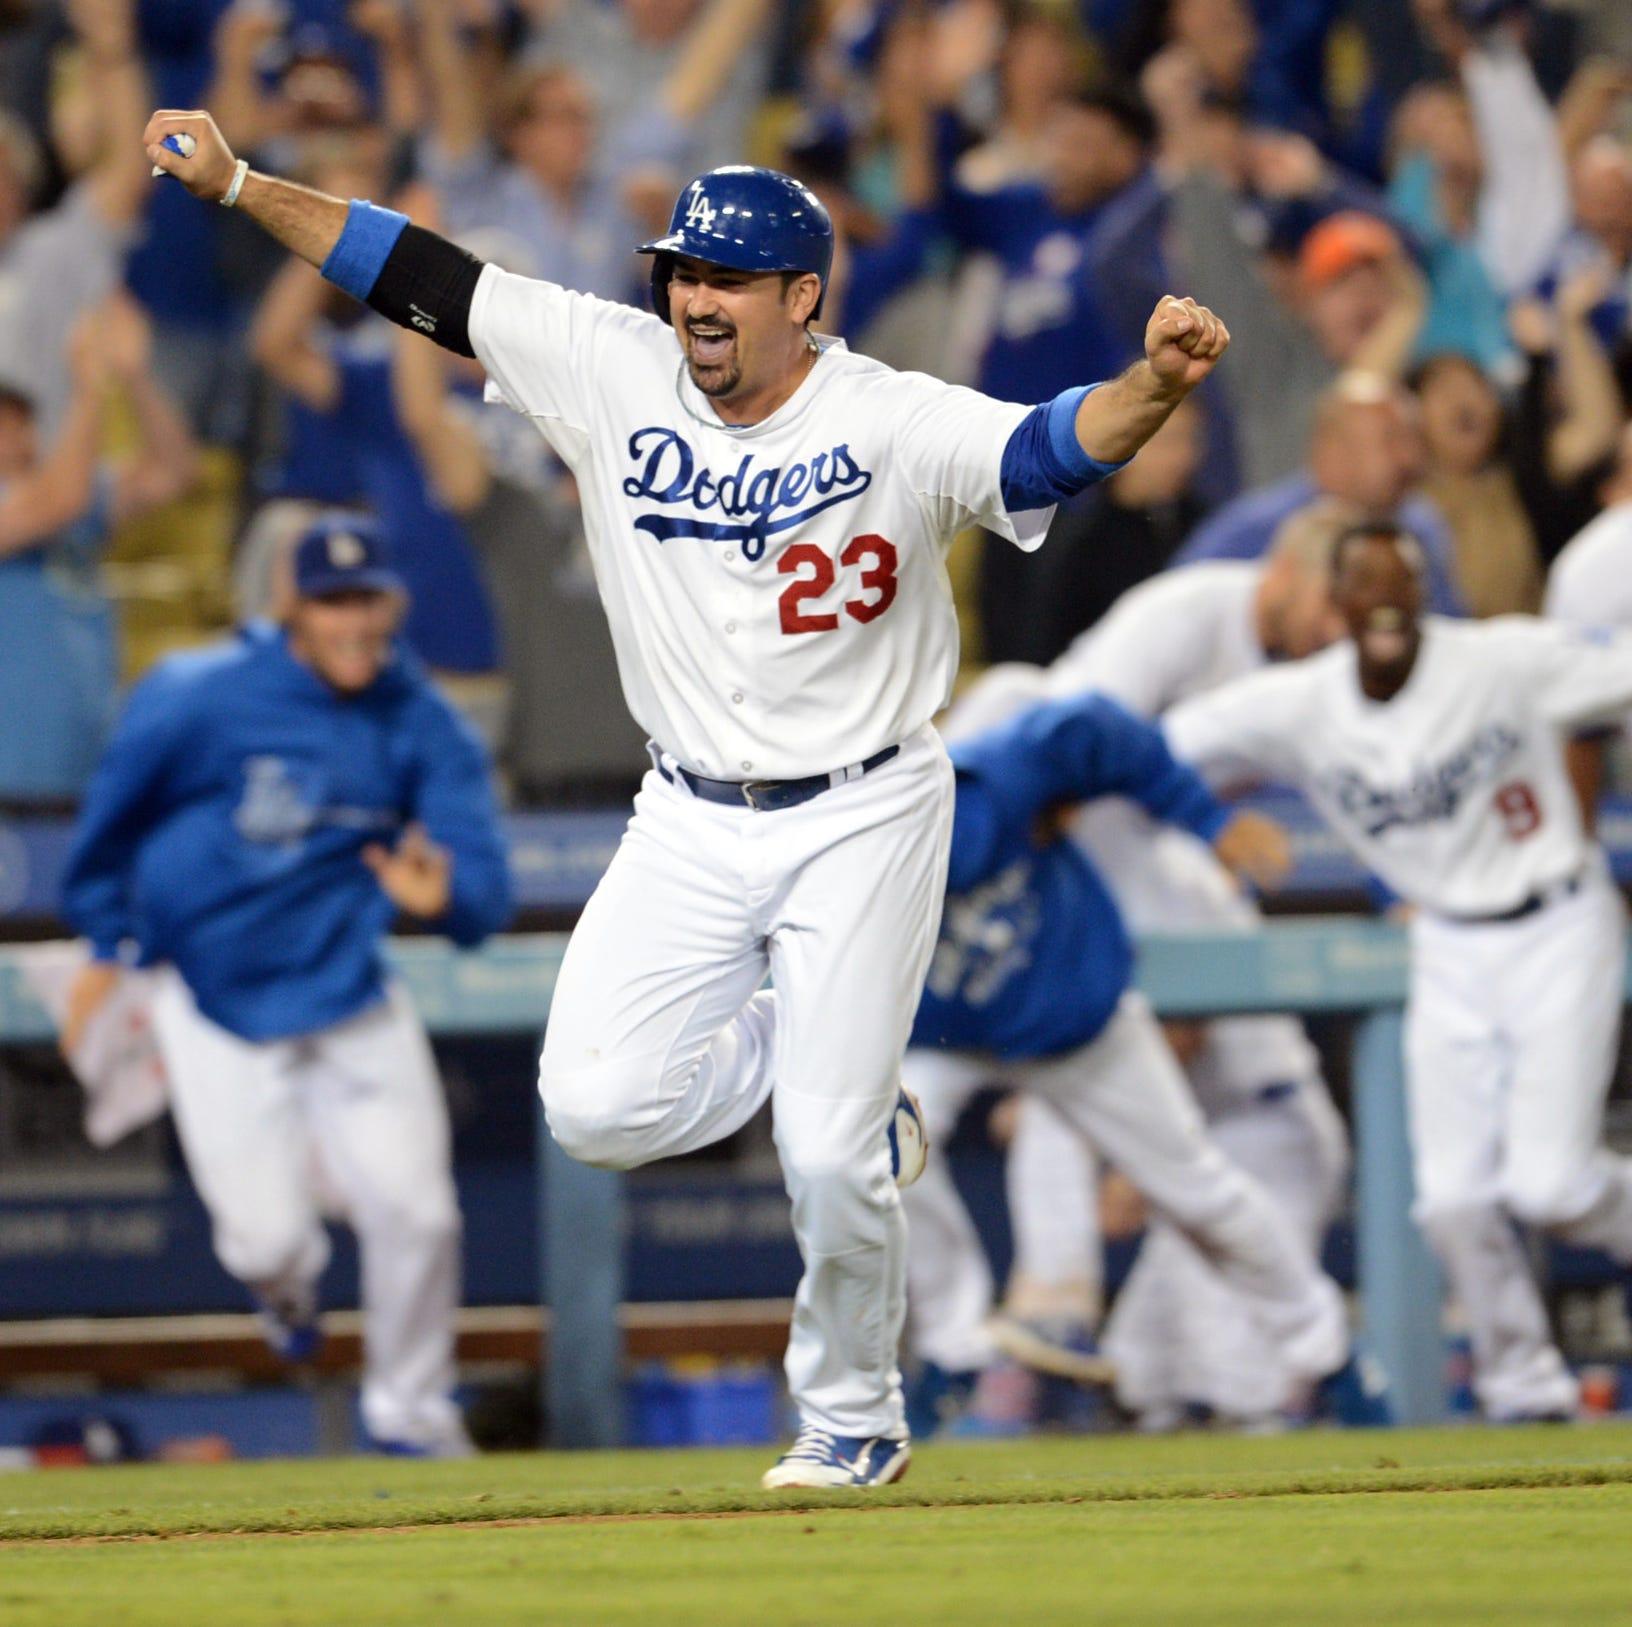 Celebrate good times: Baseball's walk-off wins